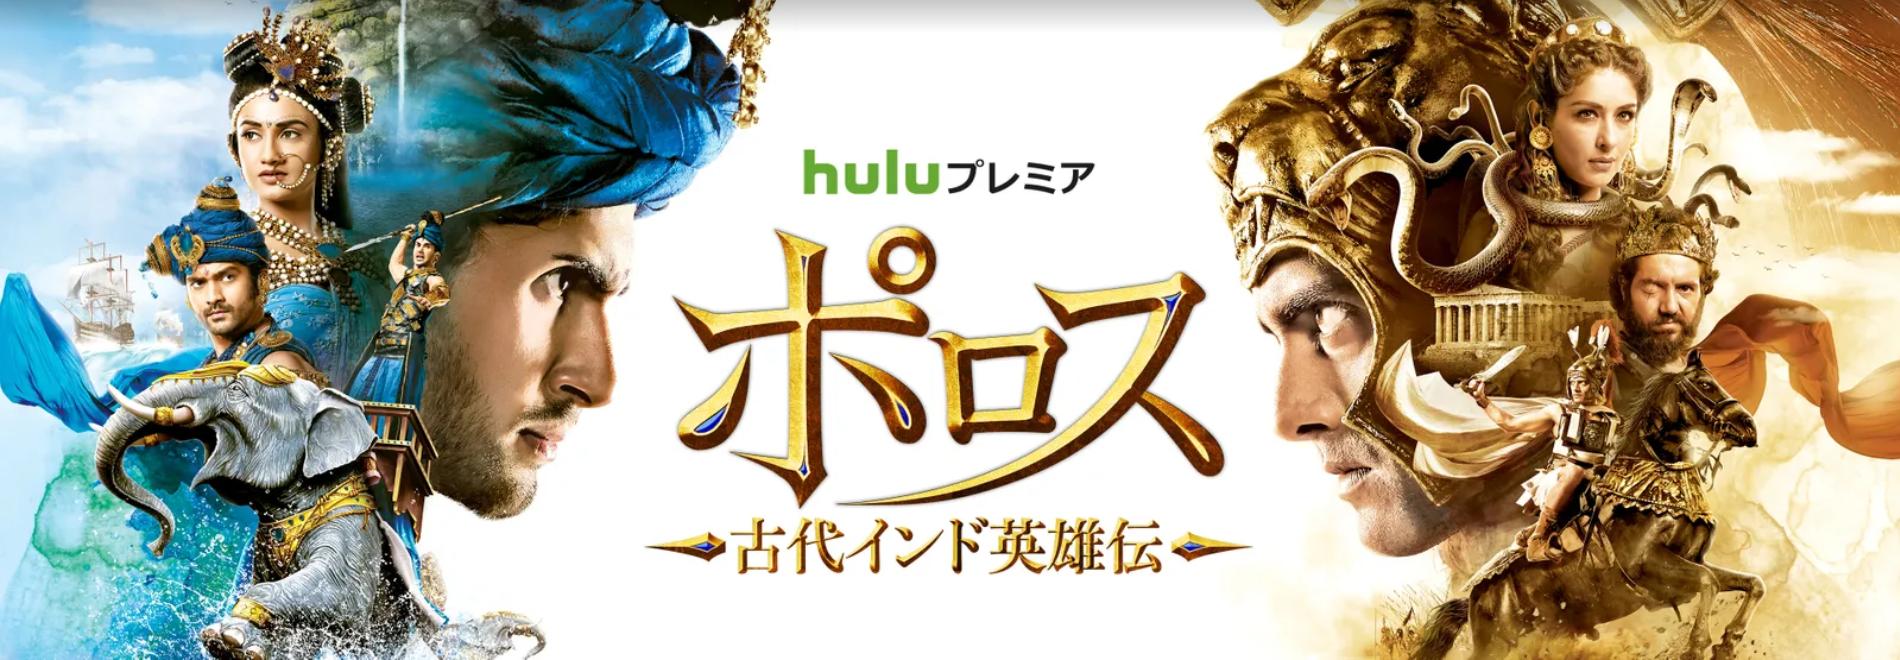 【Huluおすすめ海外ドラマ】Hulu(フールー)のおすすめ海外ドラマ作品一覧|ウォーキングデッド・ゲームオブスローンズ・Huluプレミア作品など充実!|Huluプレミア編:ポロス ~古代インド英雄伝~ シーズン3